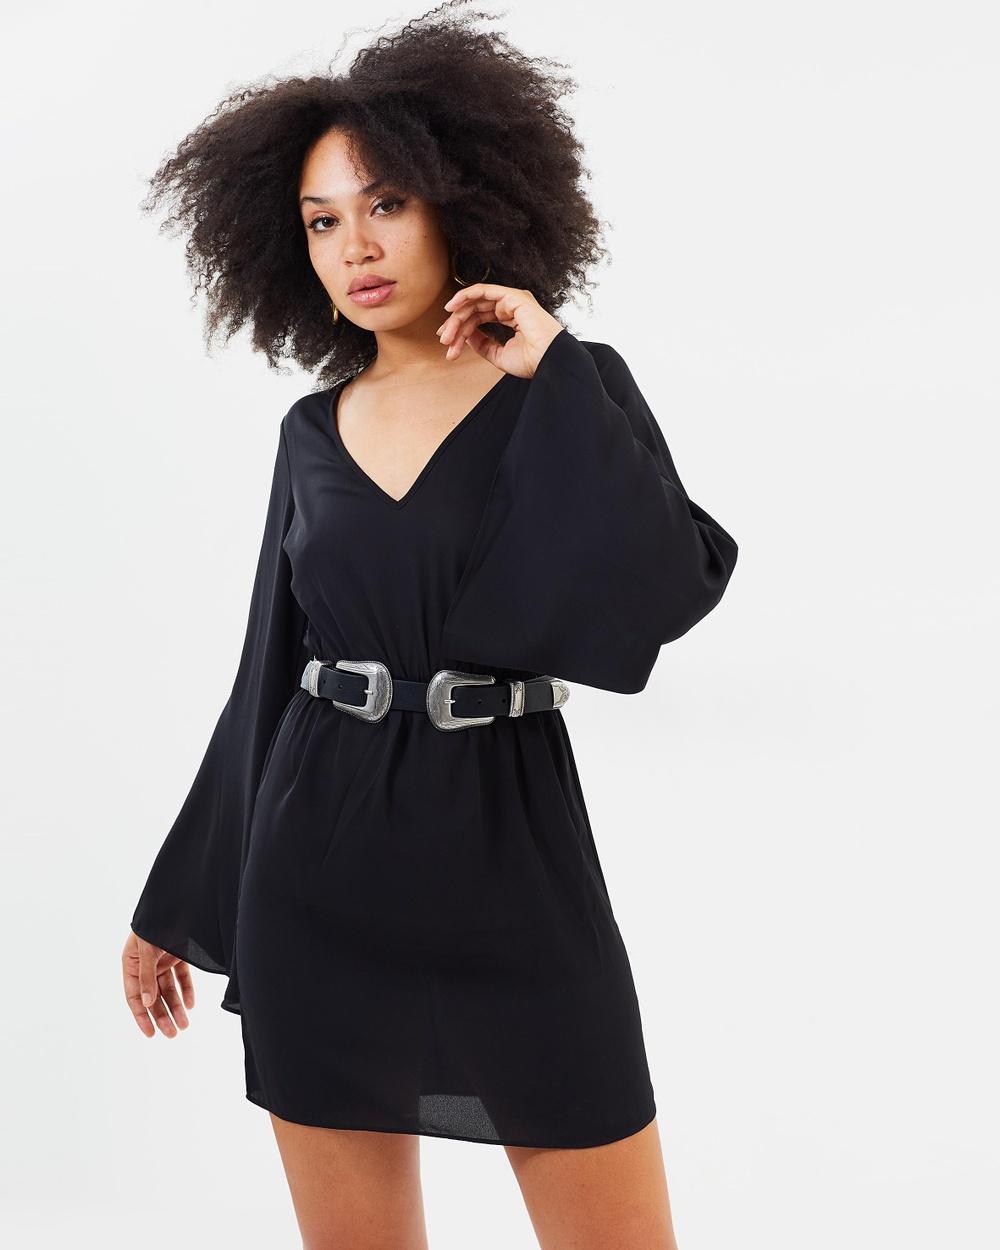 Missguided Kimono Sleeve Dress Dresses Black Kimono Sleeve Dress